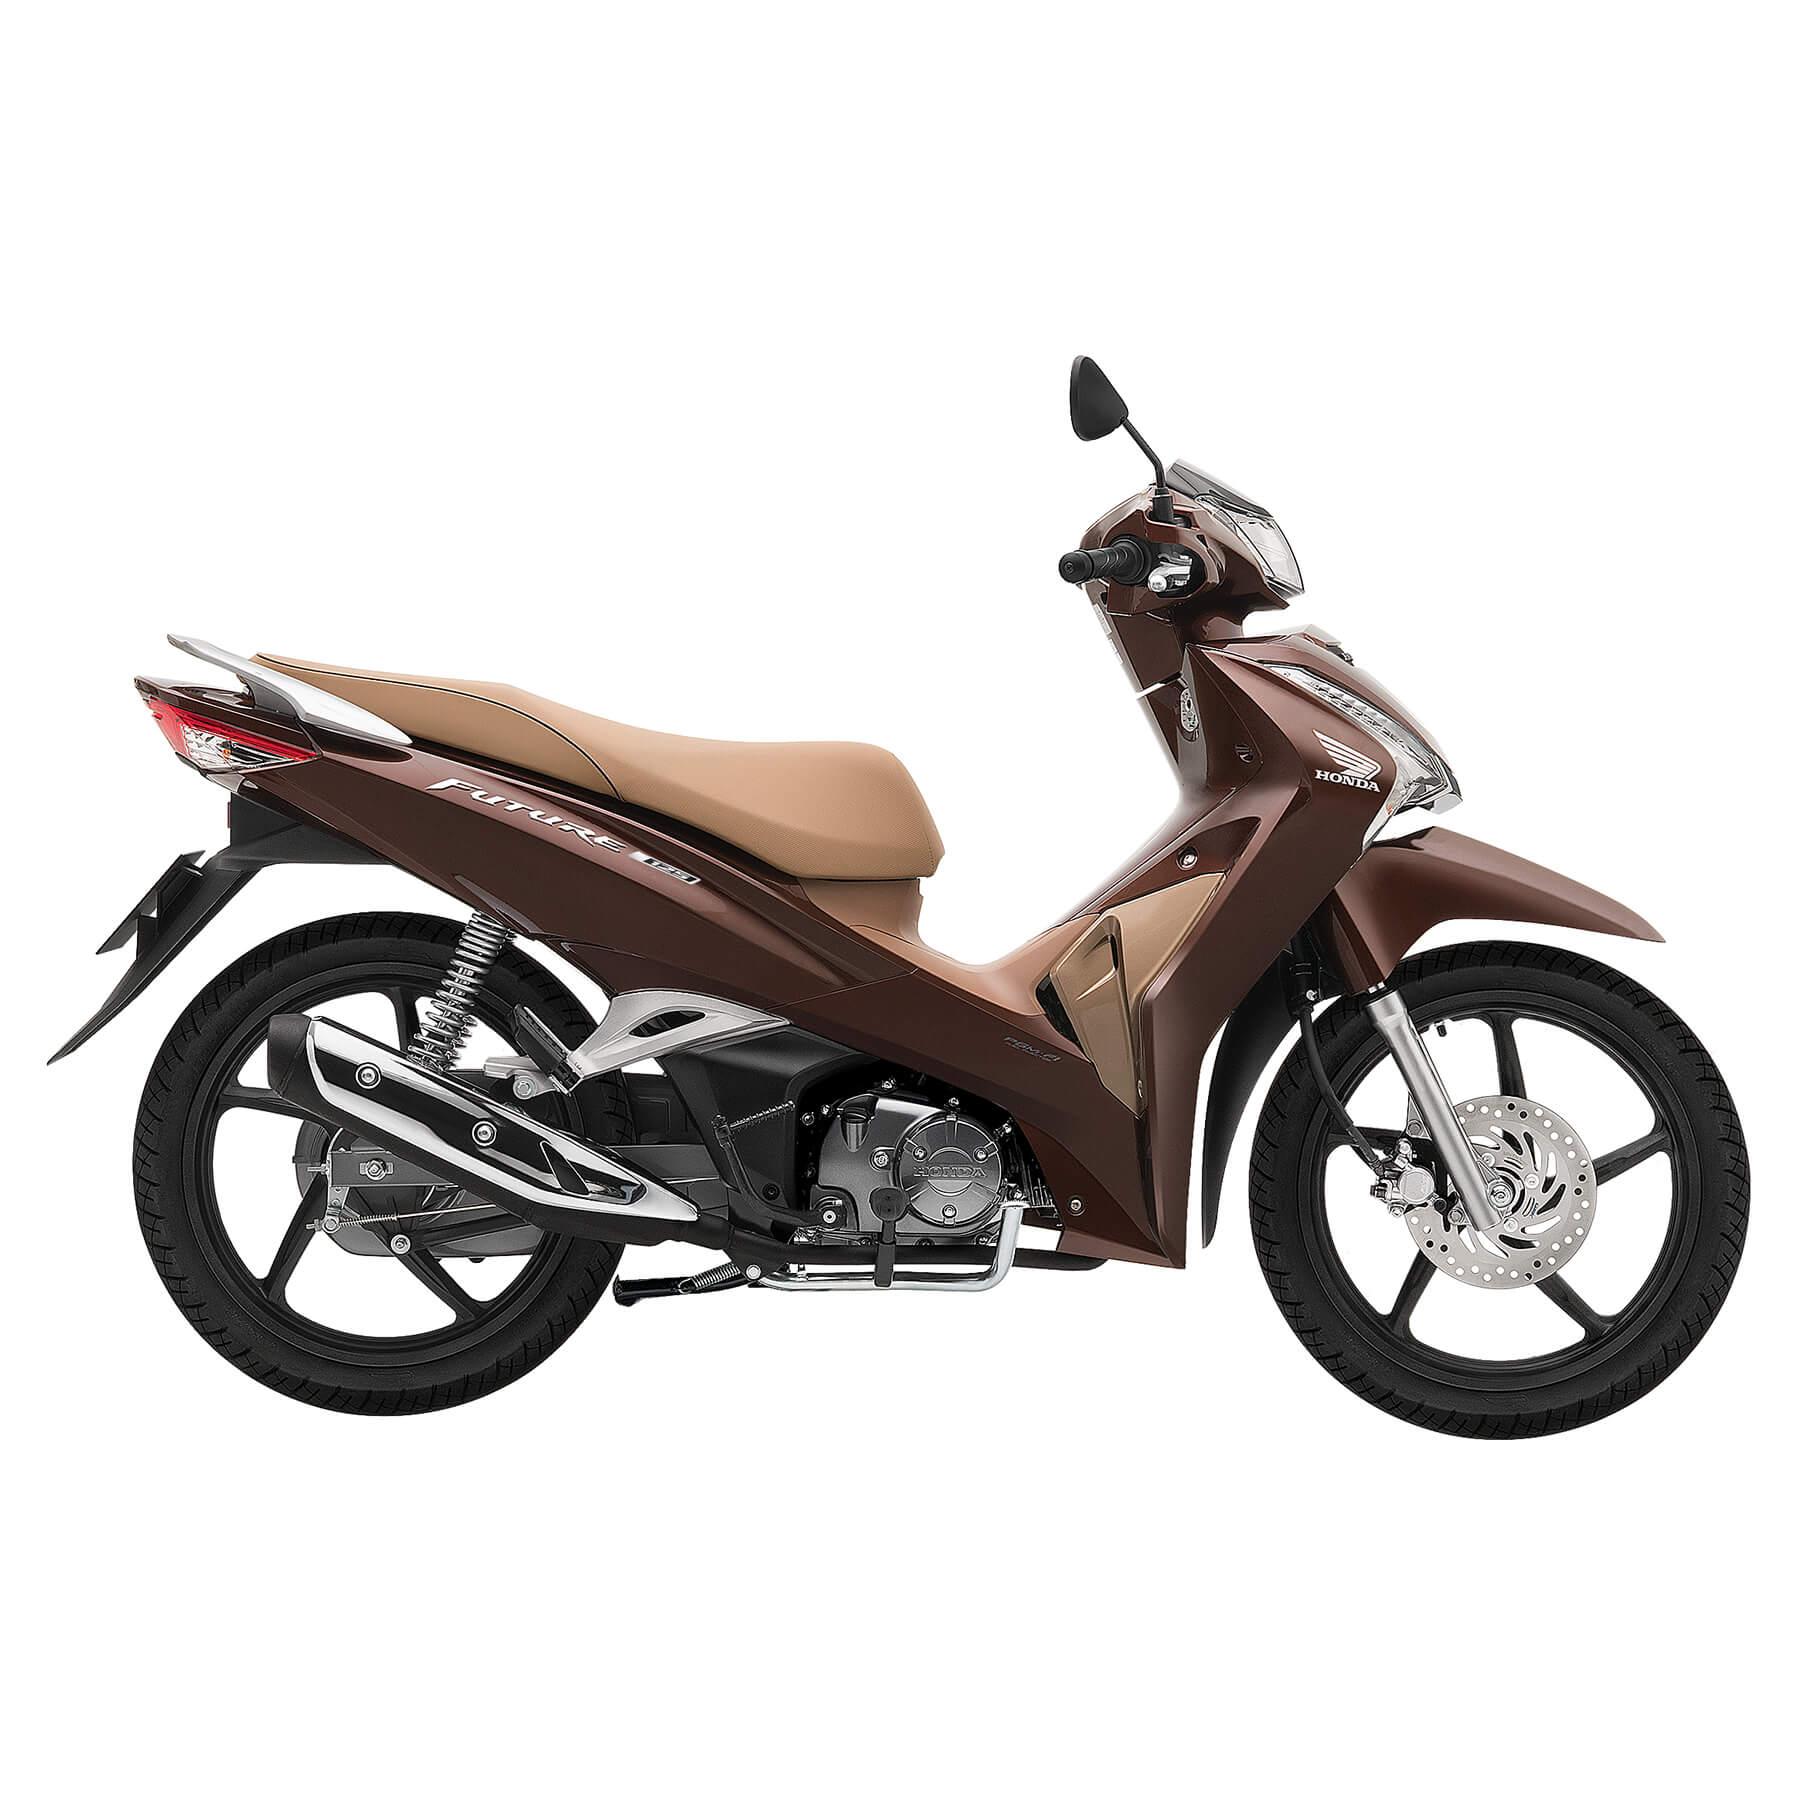 mau-vang-honda-future-2019-muaxebanxe-com